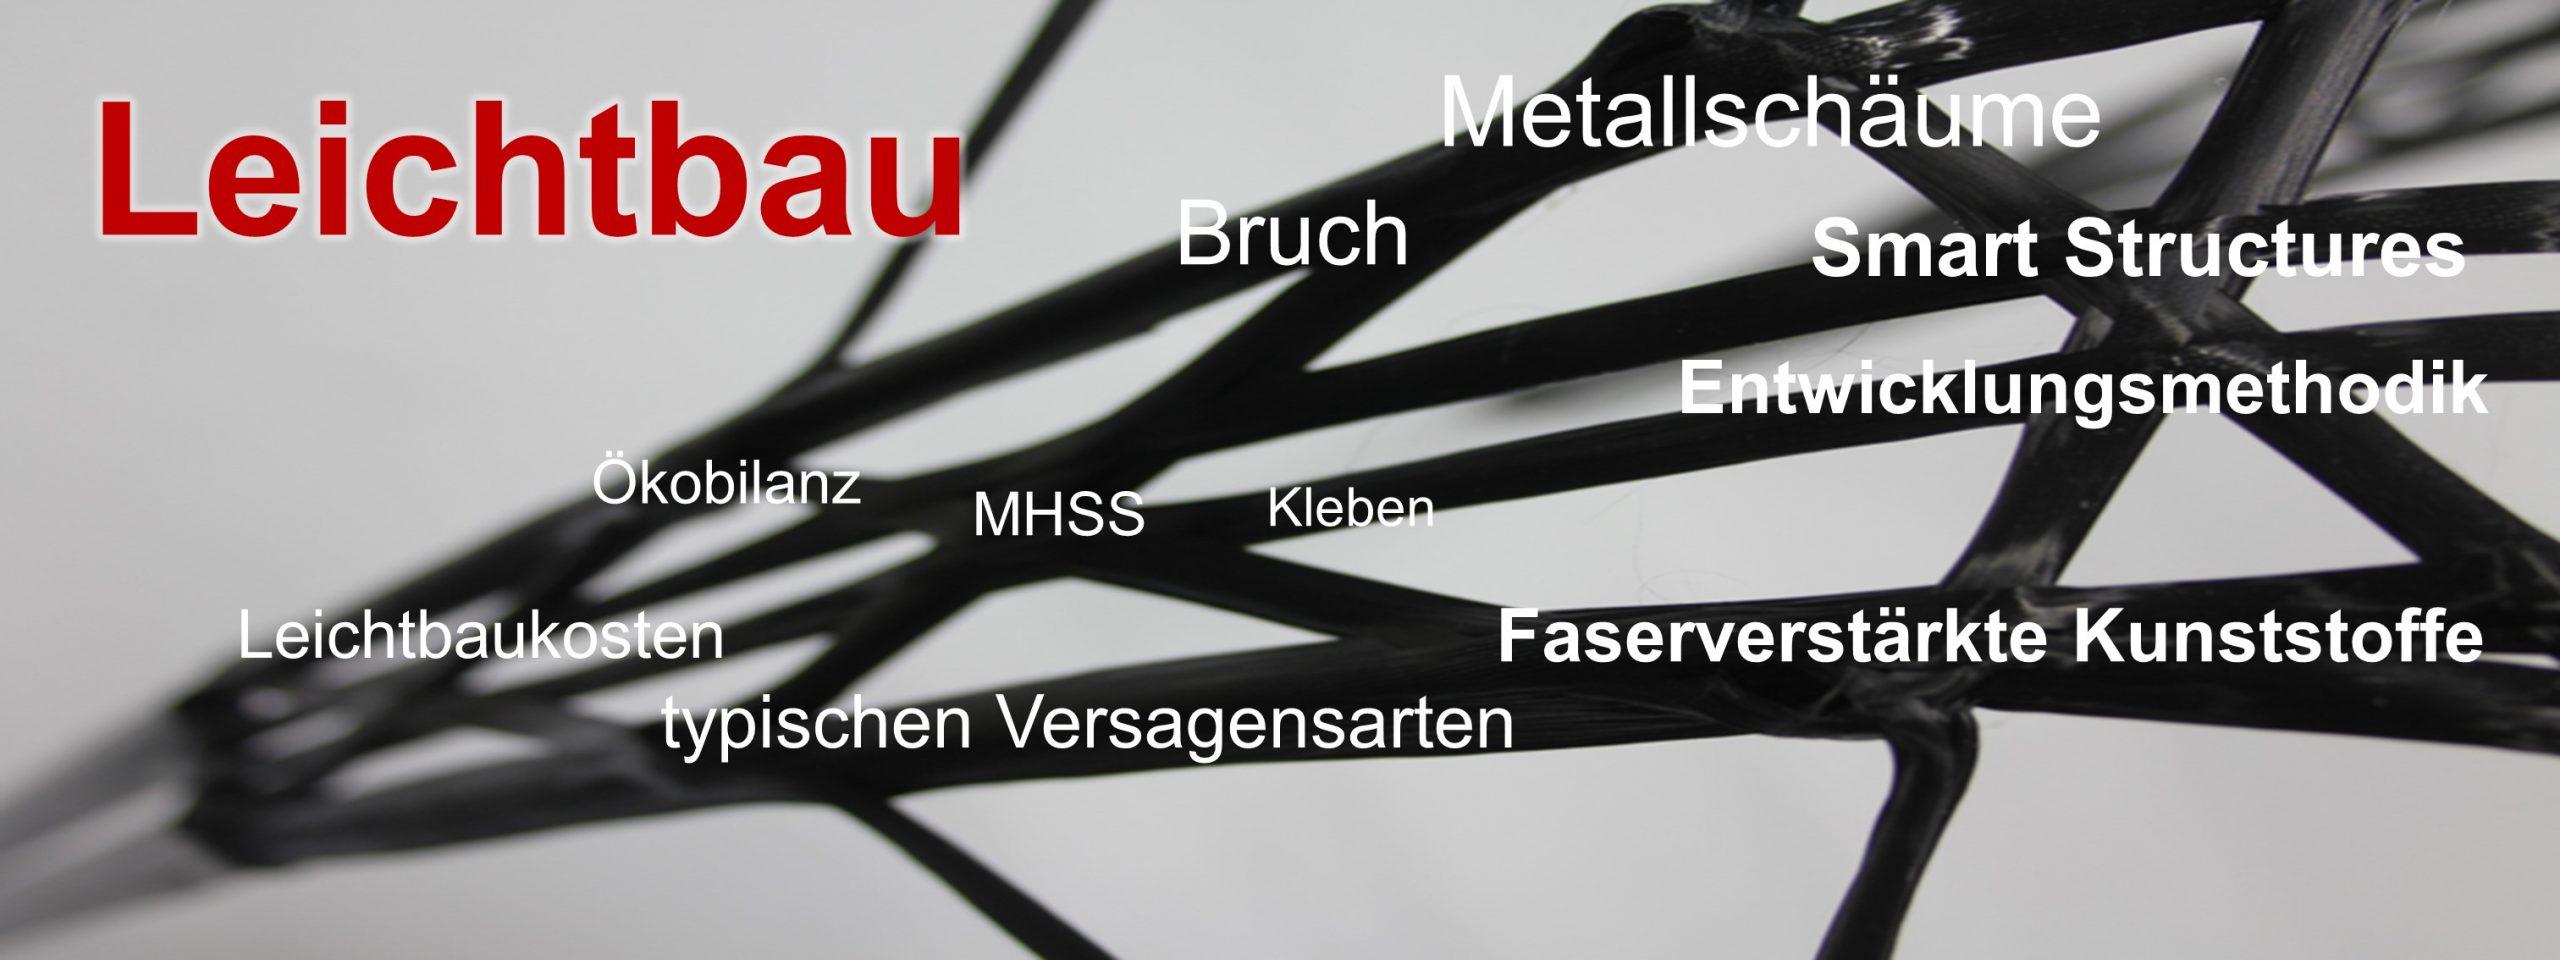 Seminar Leichtbau Einbock Akademie